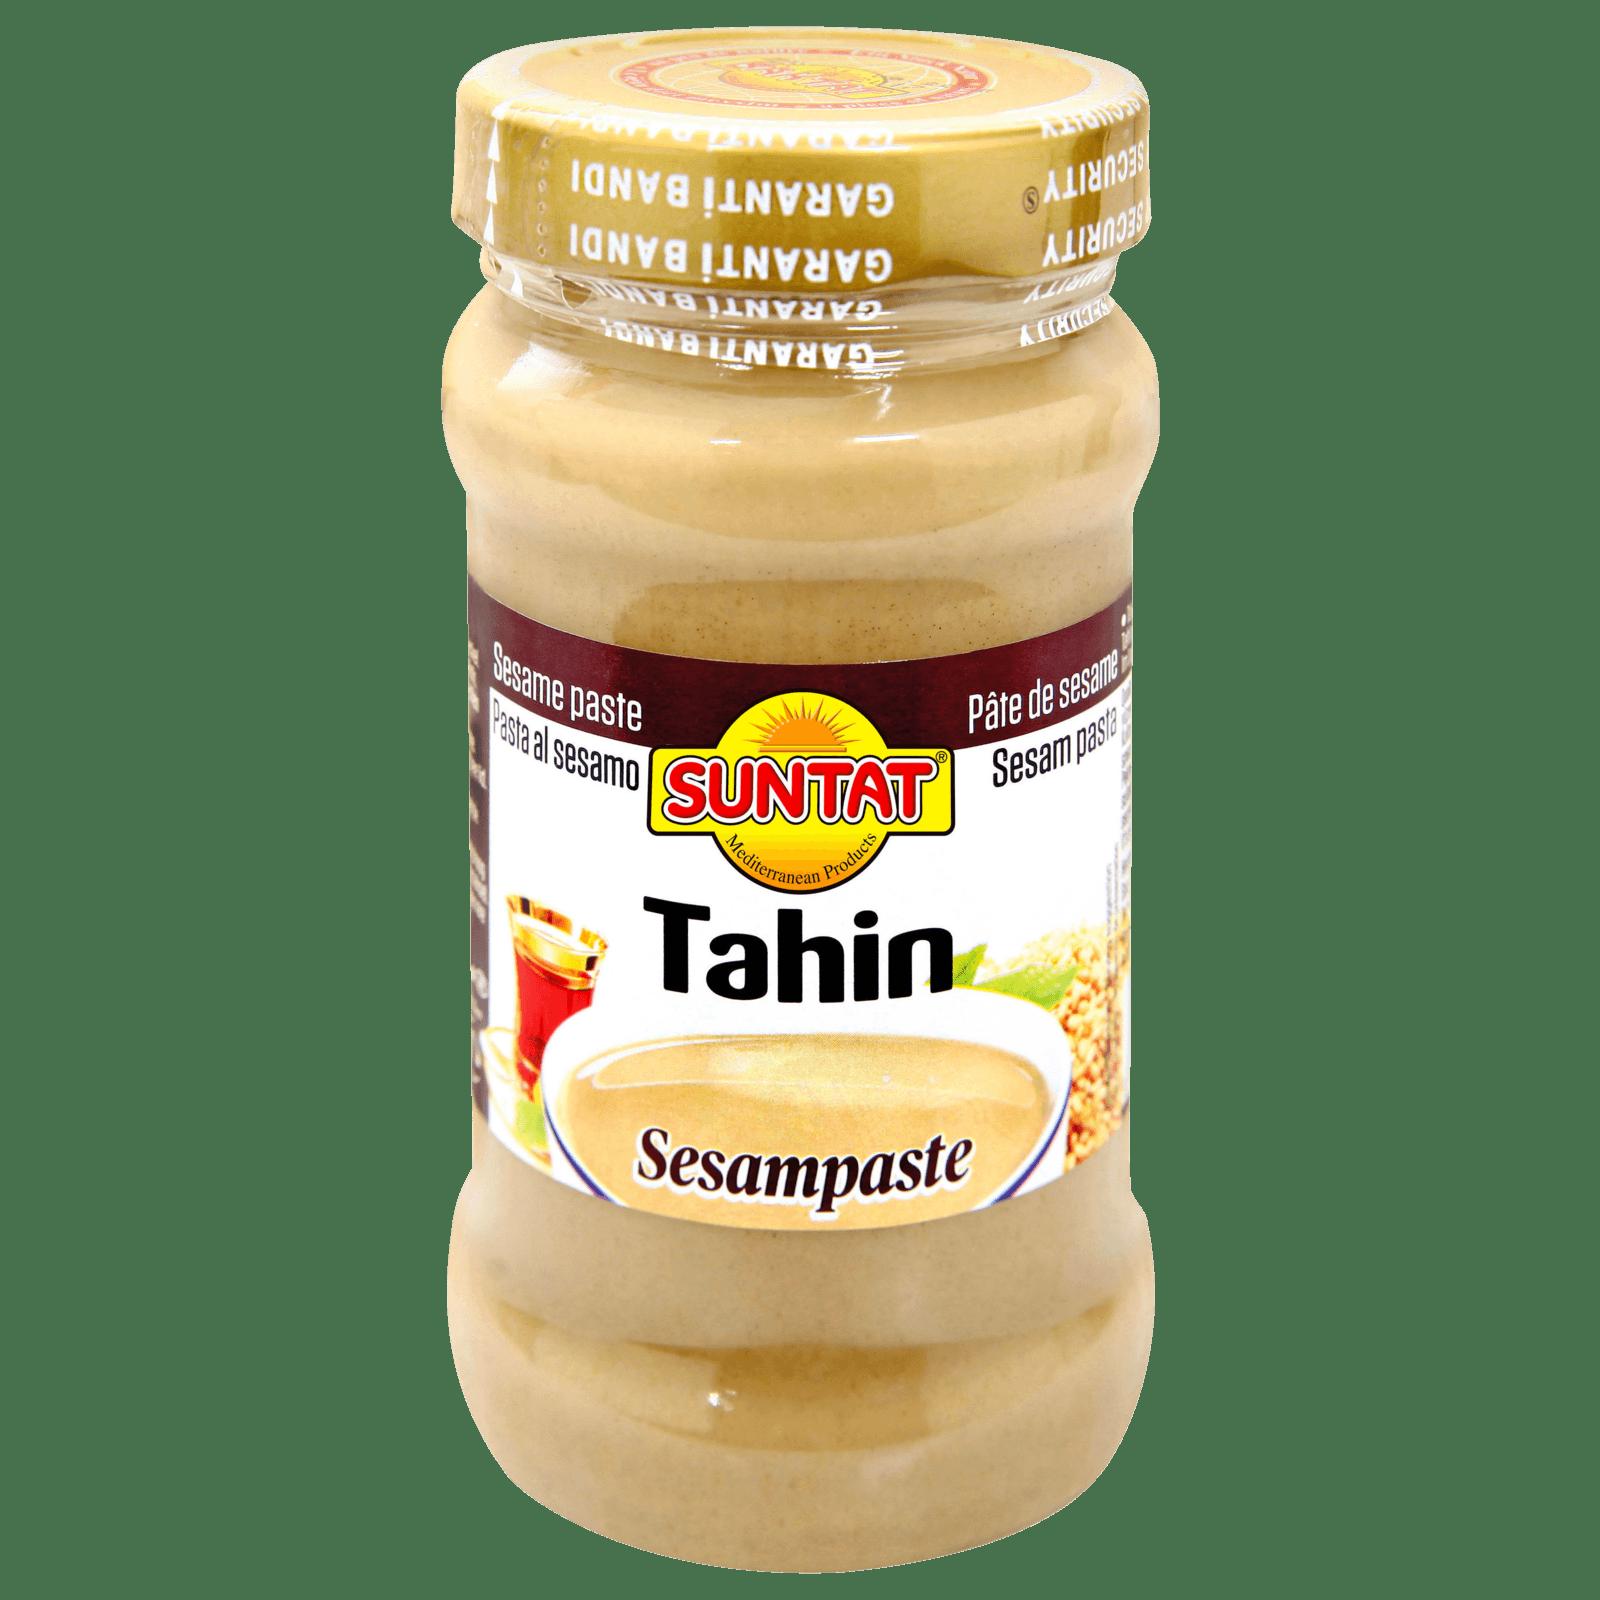 Suntat Tahin / Sesampaste 300ml